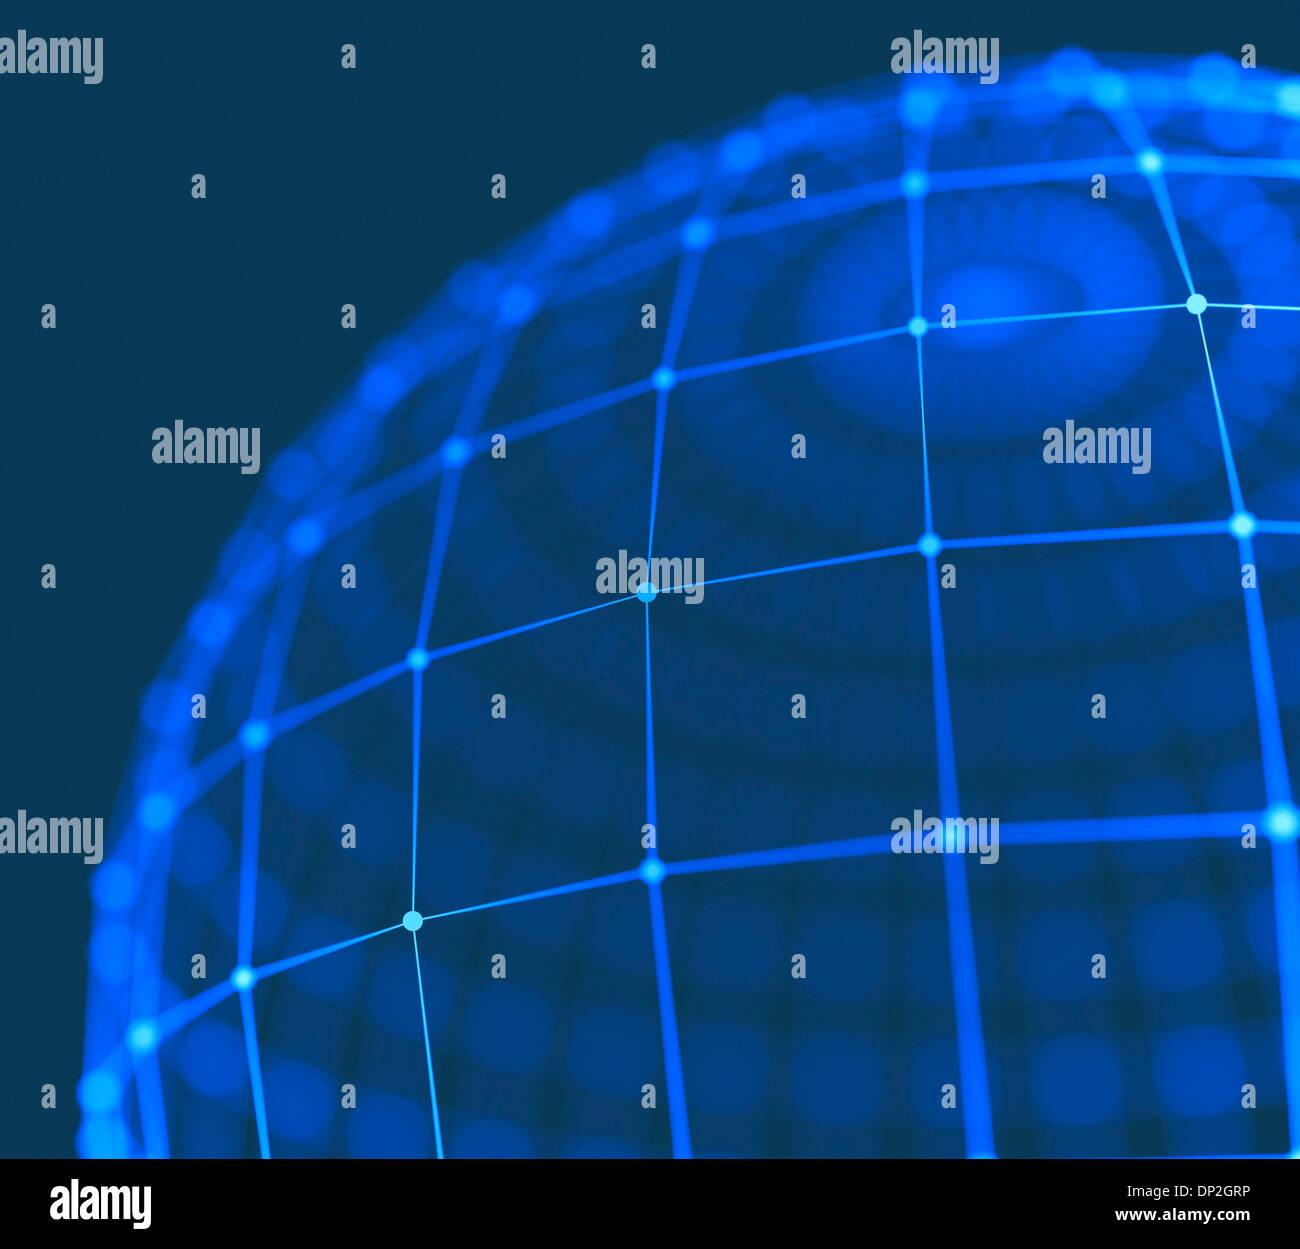 Mundo Digital, obra conceptual Imagen De Stock